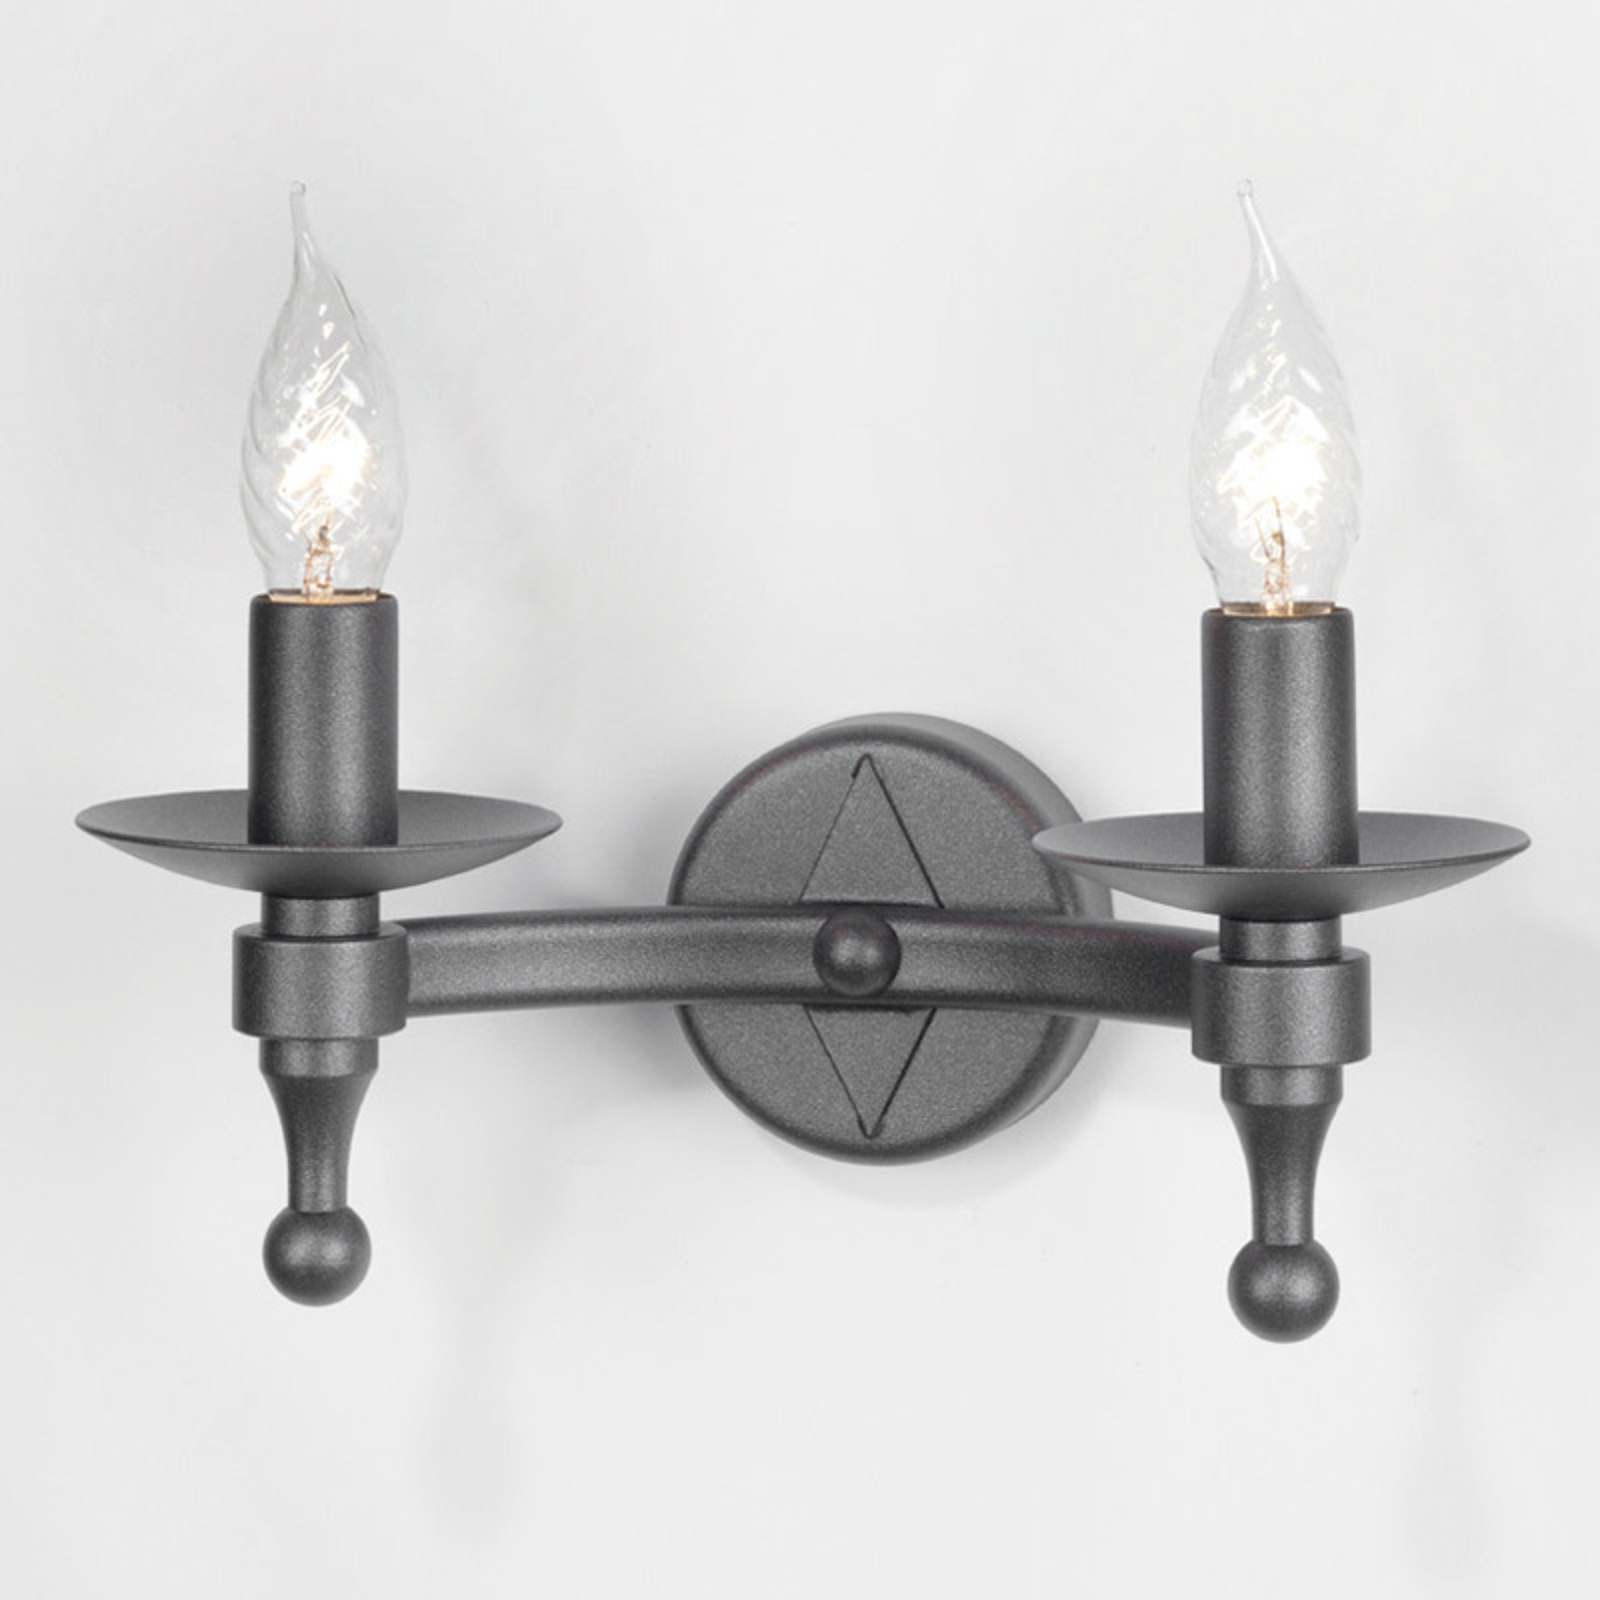 Smeedijzeren wandlamp WARWICK, grafiet